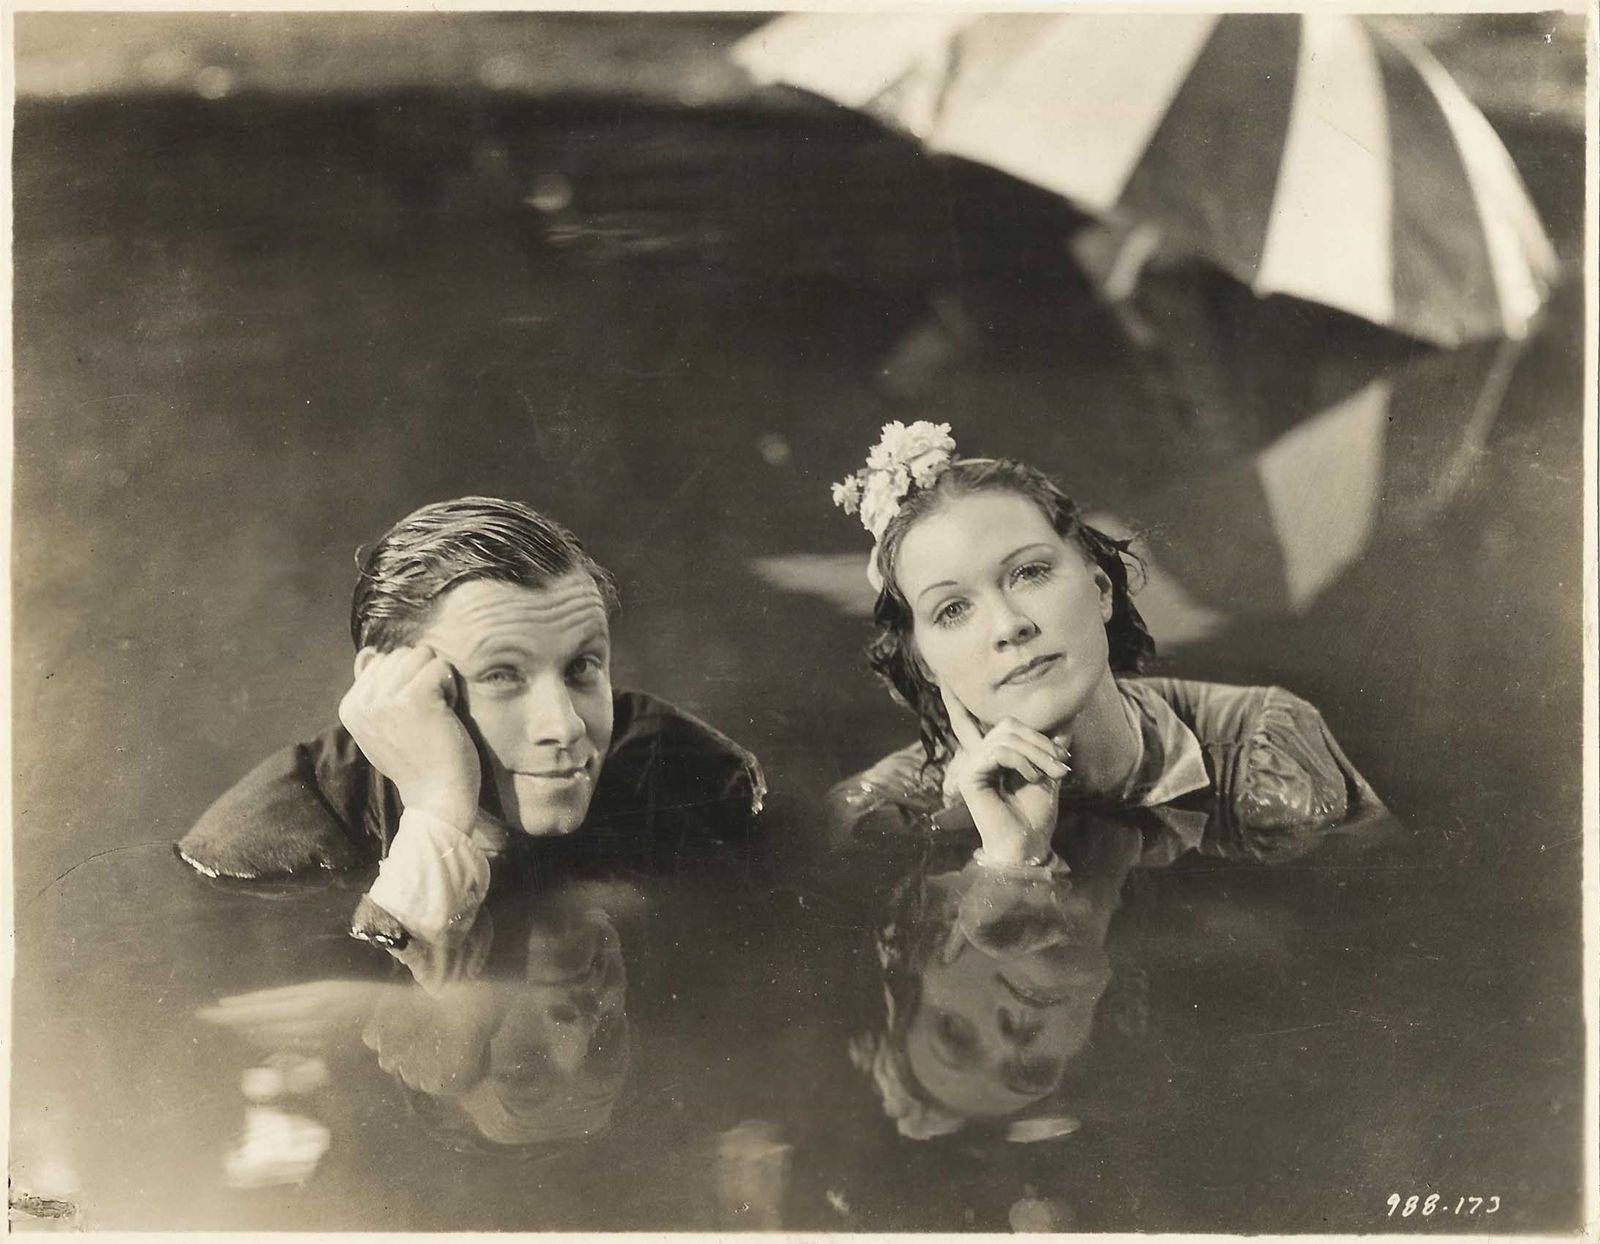 George Murphy and Eleanor Powell